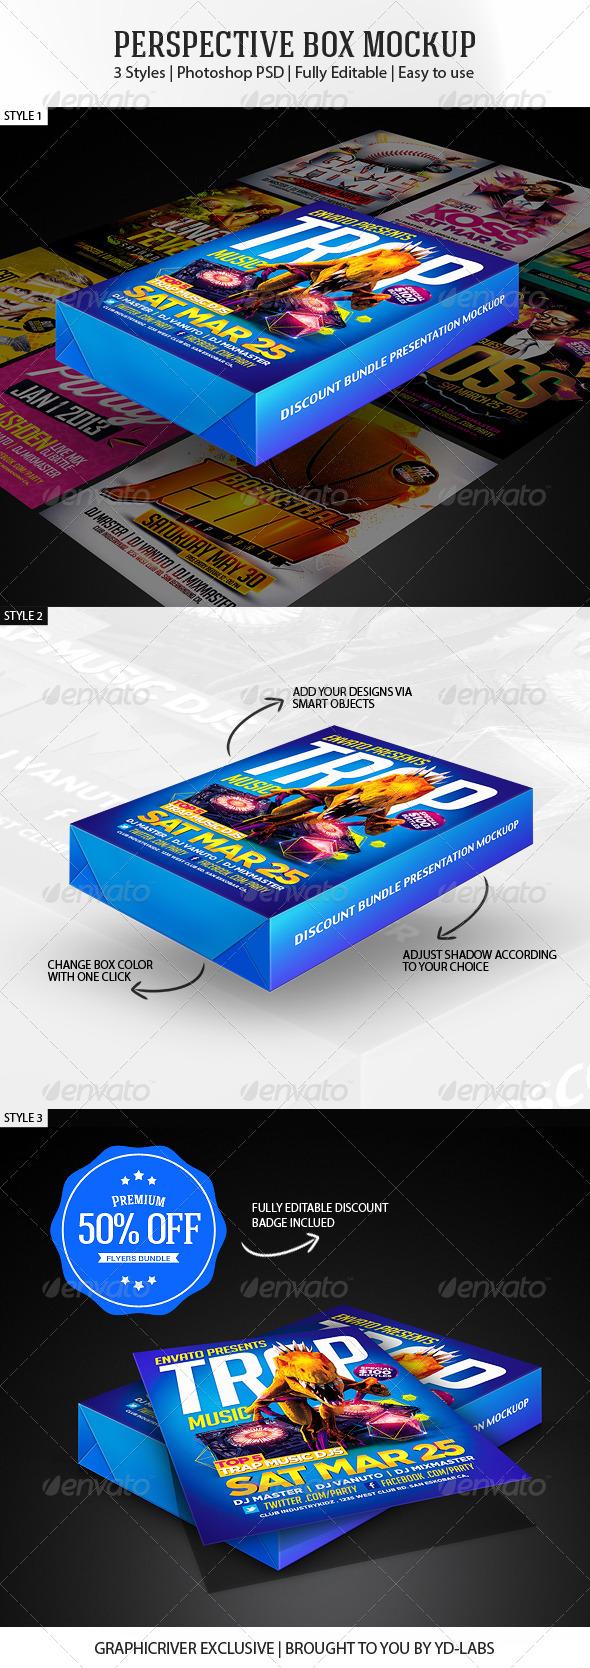 GraphicRiver Perspective Box Mockup V1 6432356